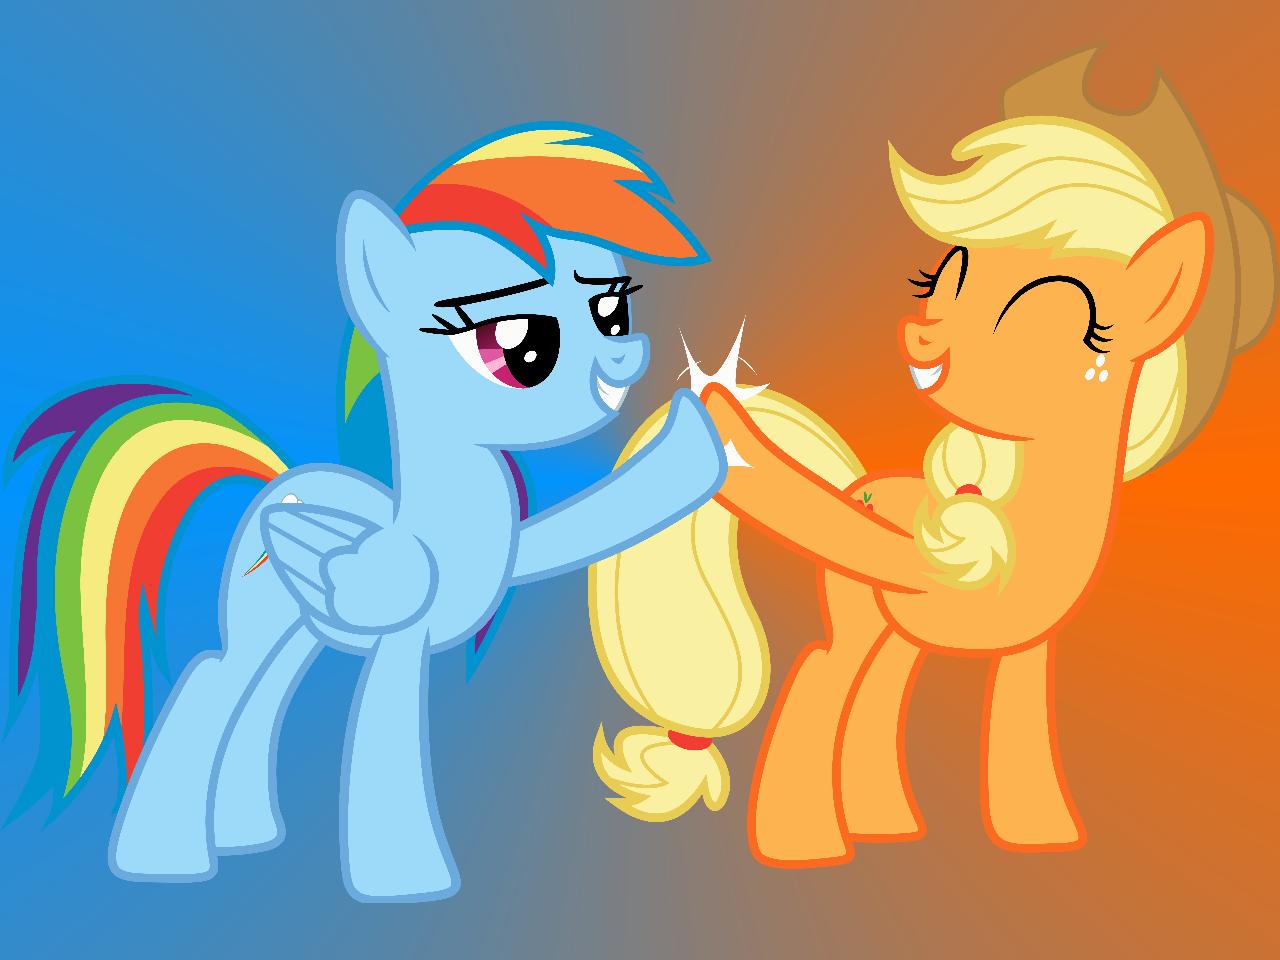 Applejack And Rainbow Dash Wallpaper By Lionovsky On Deviantart Rainbow Dash Applejack My Little Pony Friendship